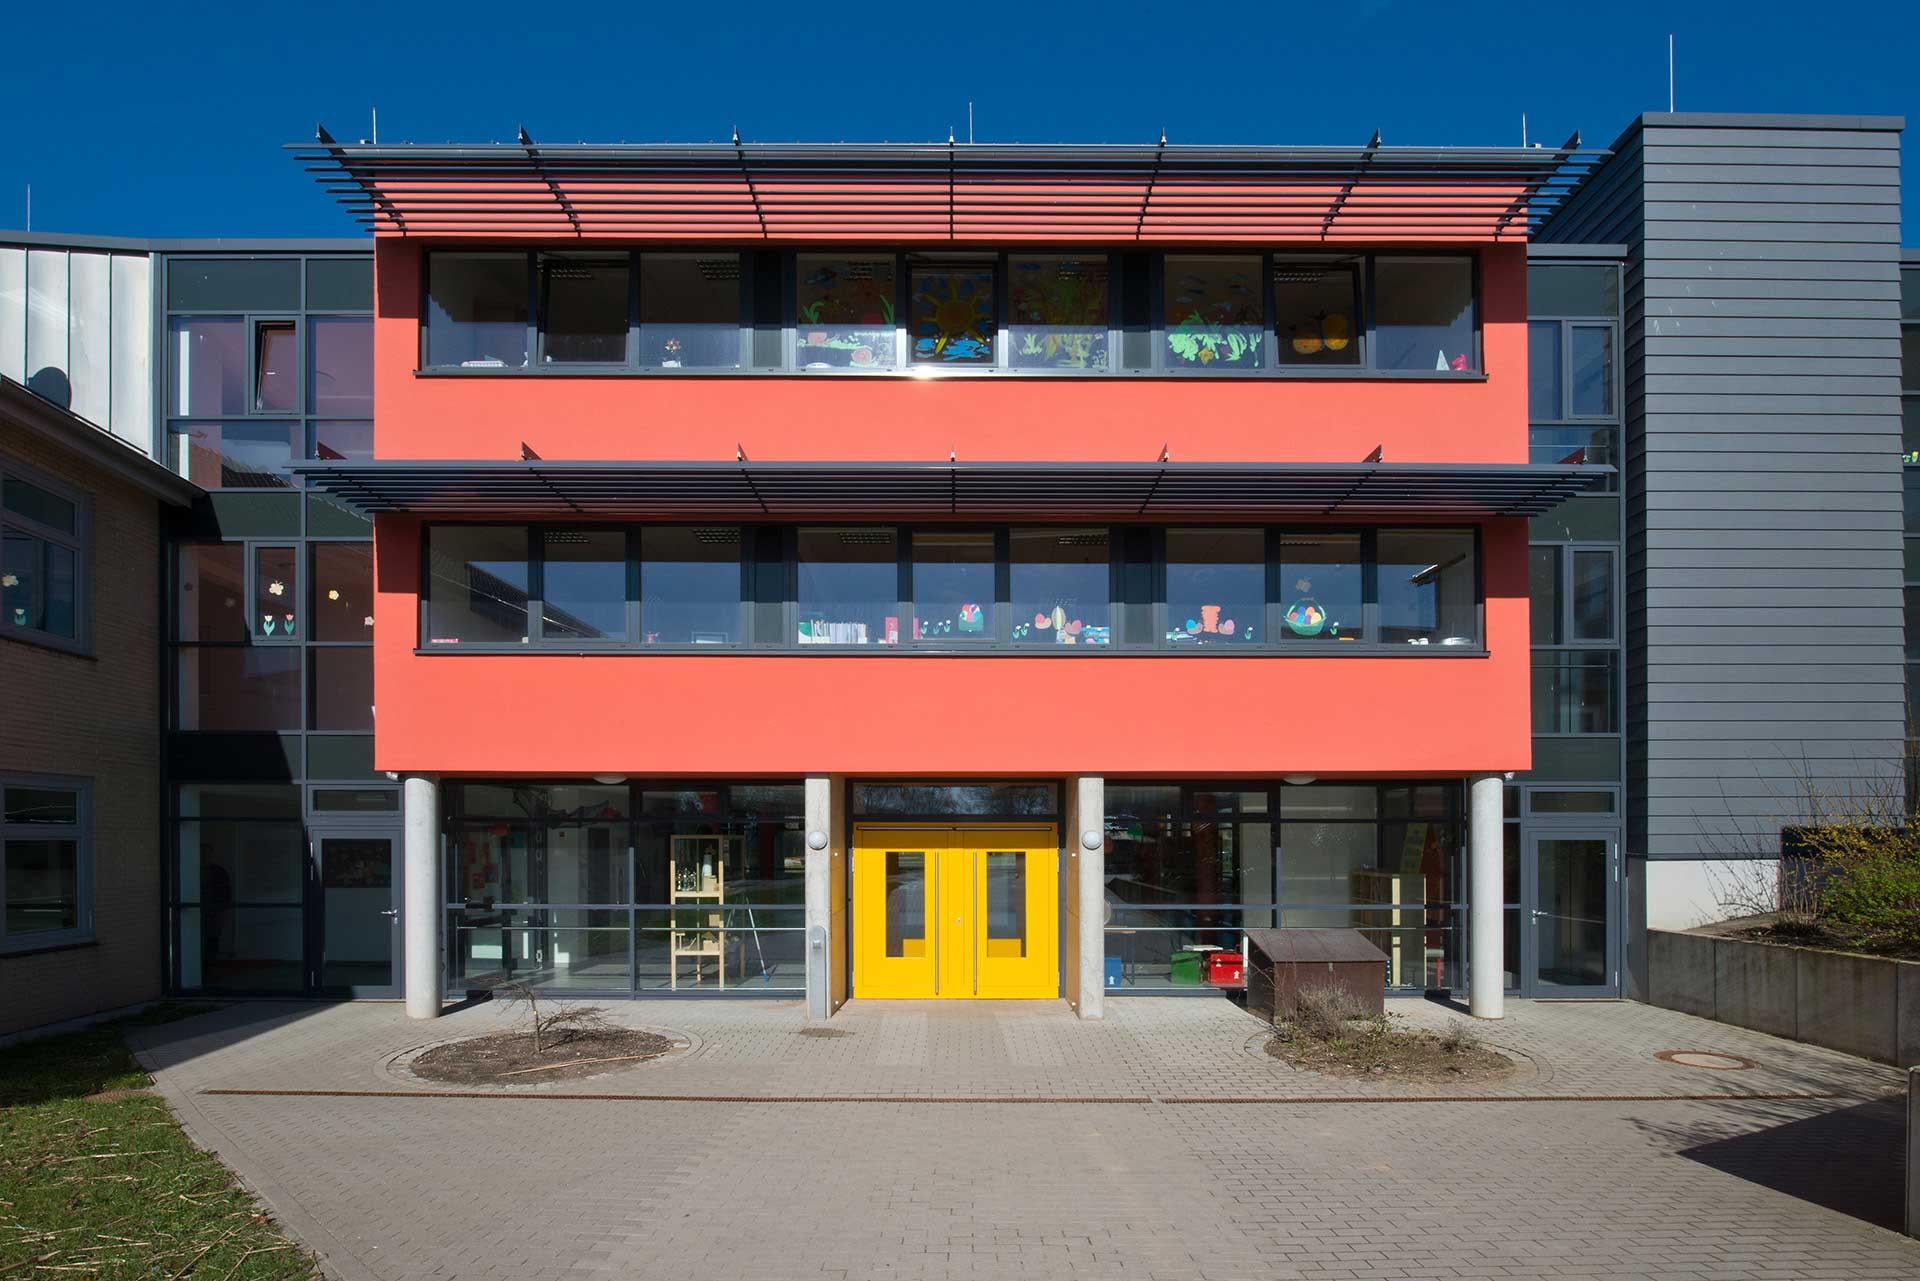 01-janiak-lippert_Schule-Winnemark-Sundsacker